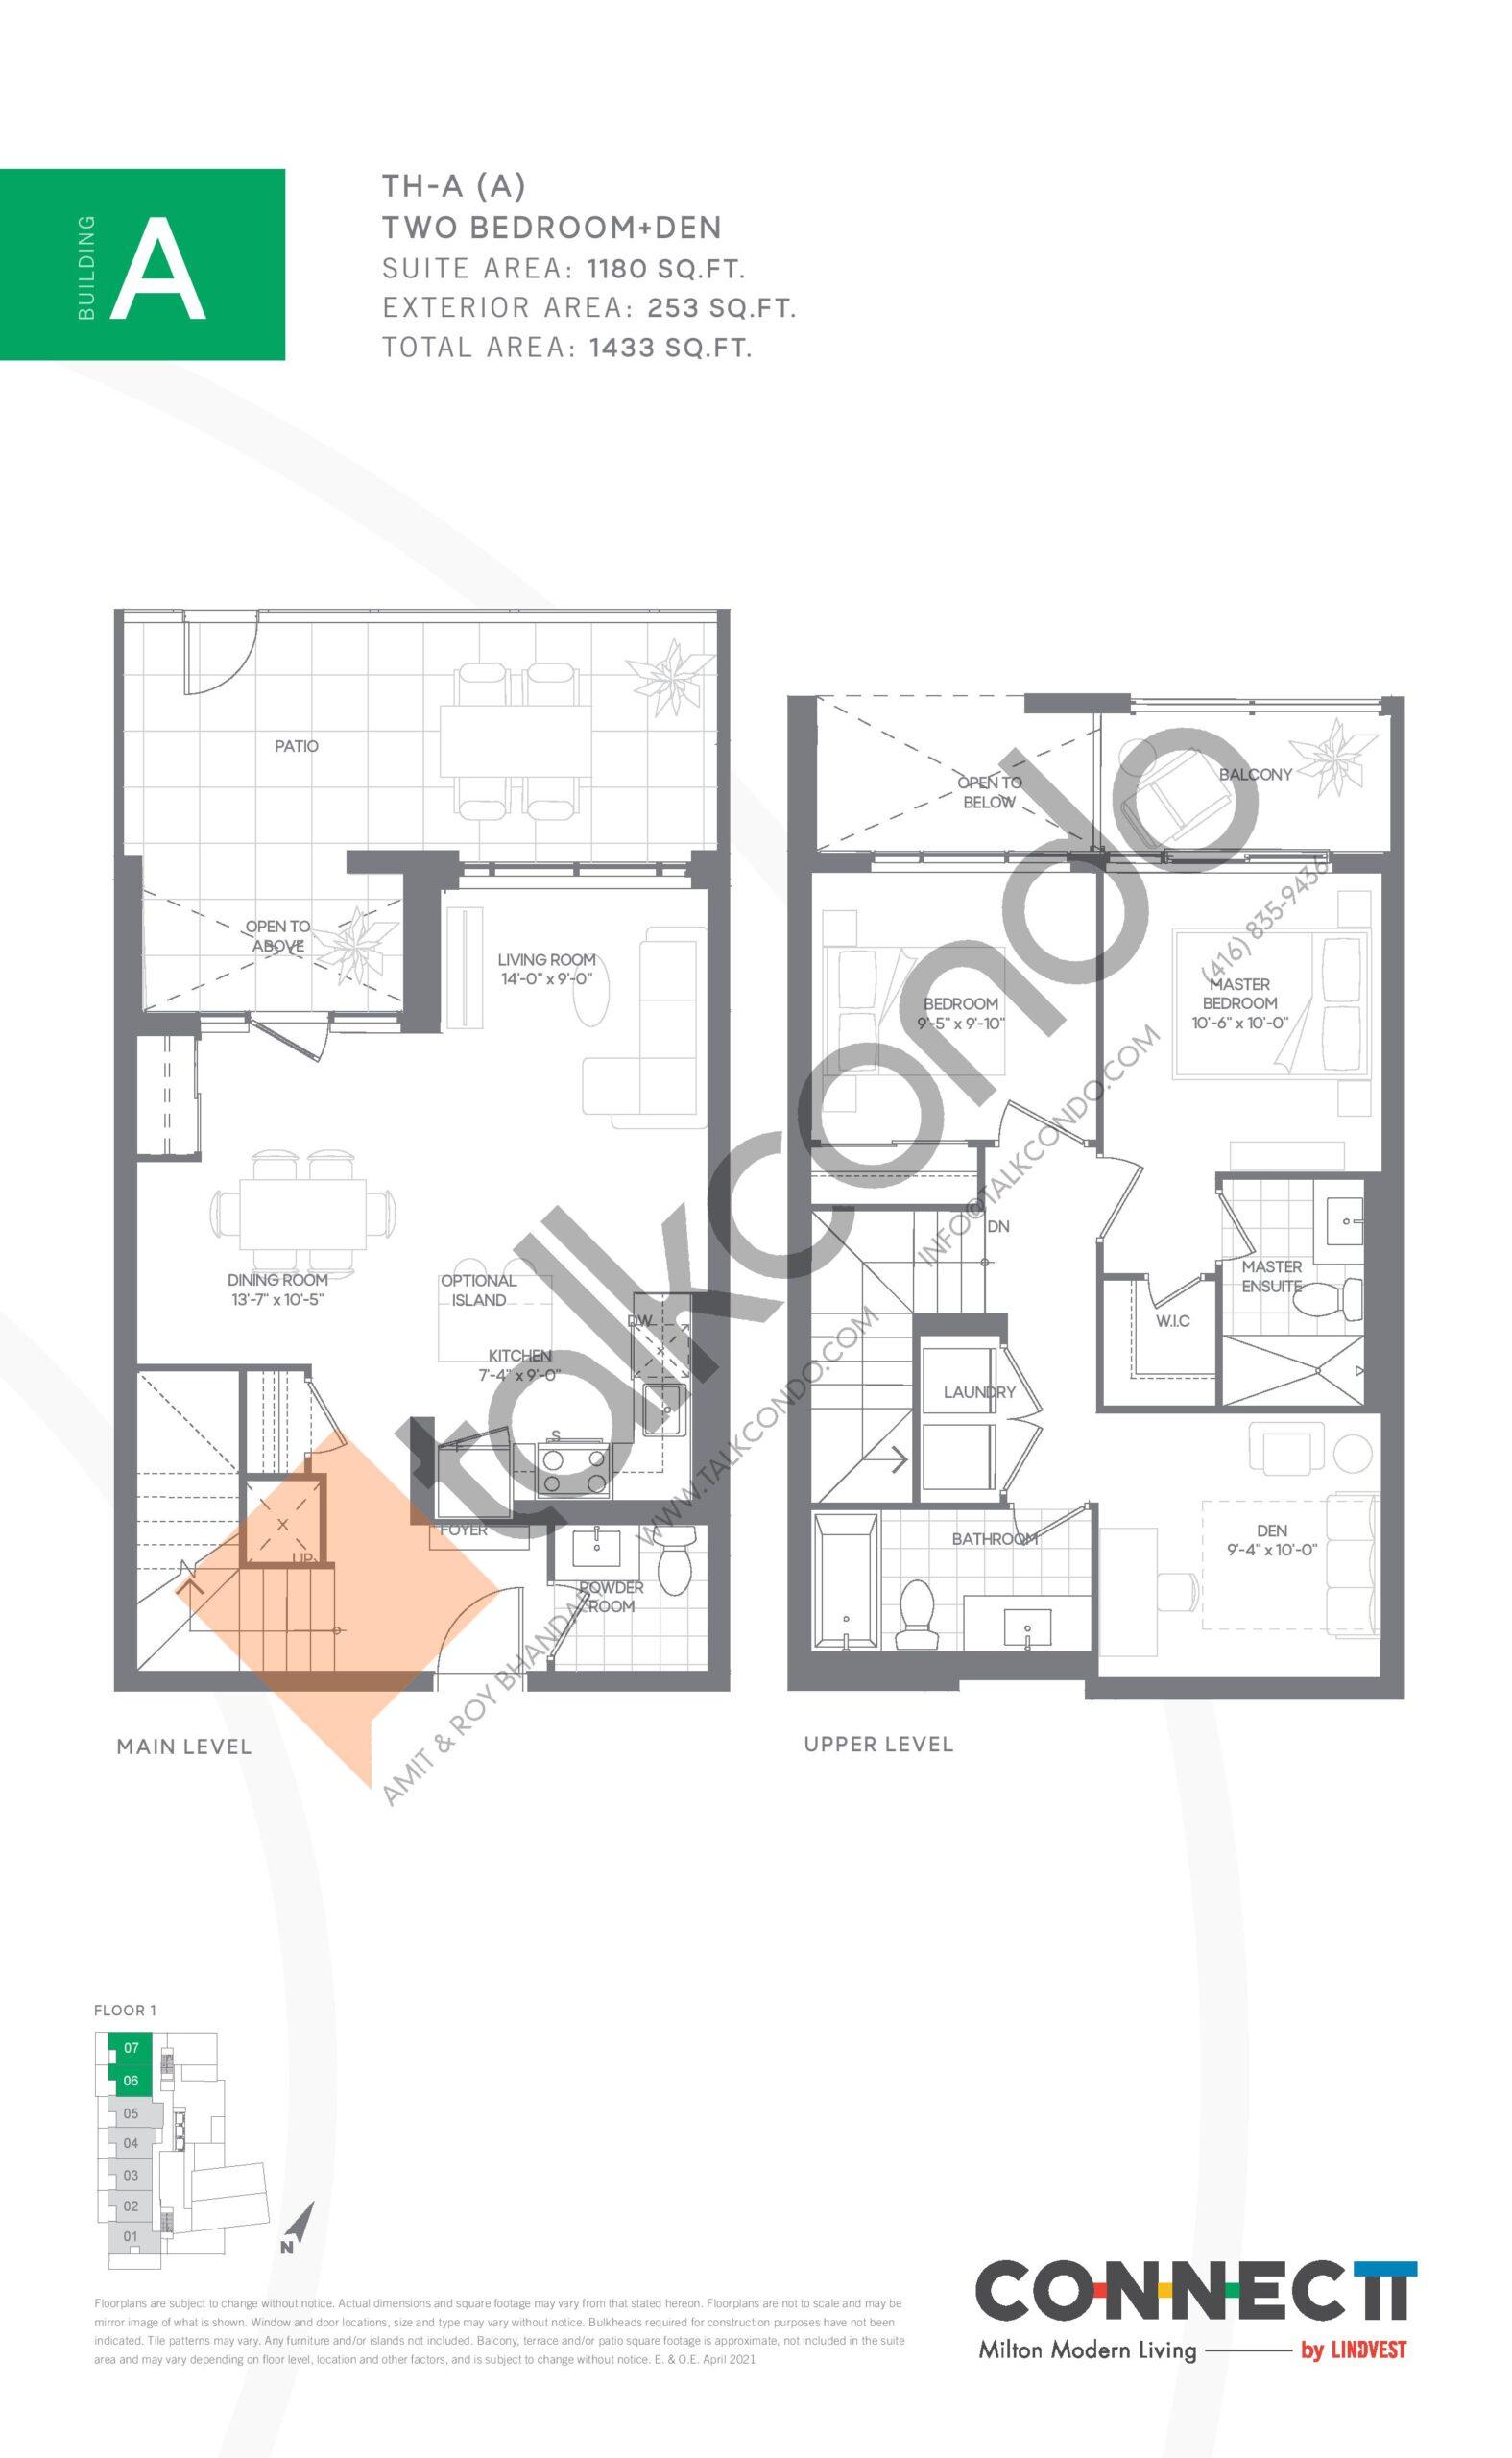 TH-A (A) Floor Plan at Connectt Urban Community Condos - 1180 sq.ft